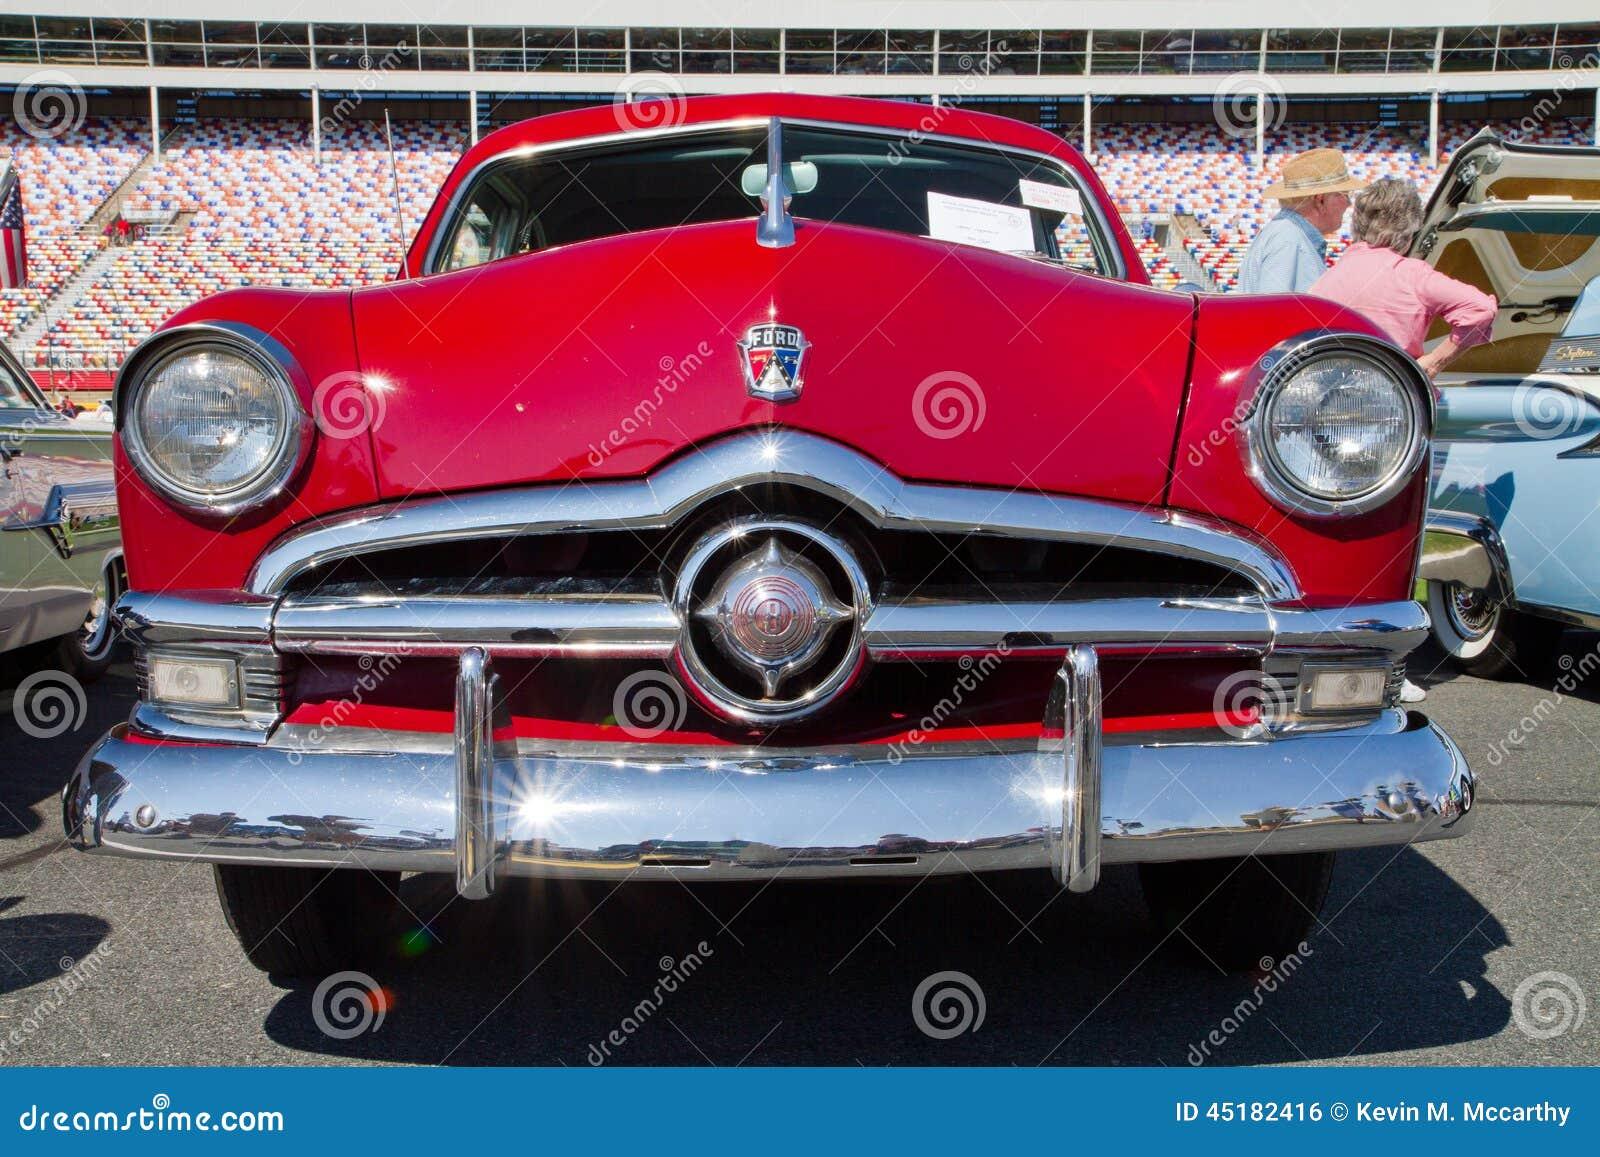 Classic 1950 Ford Automobile